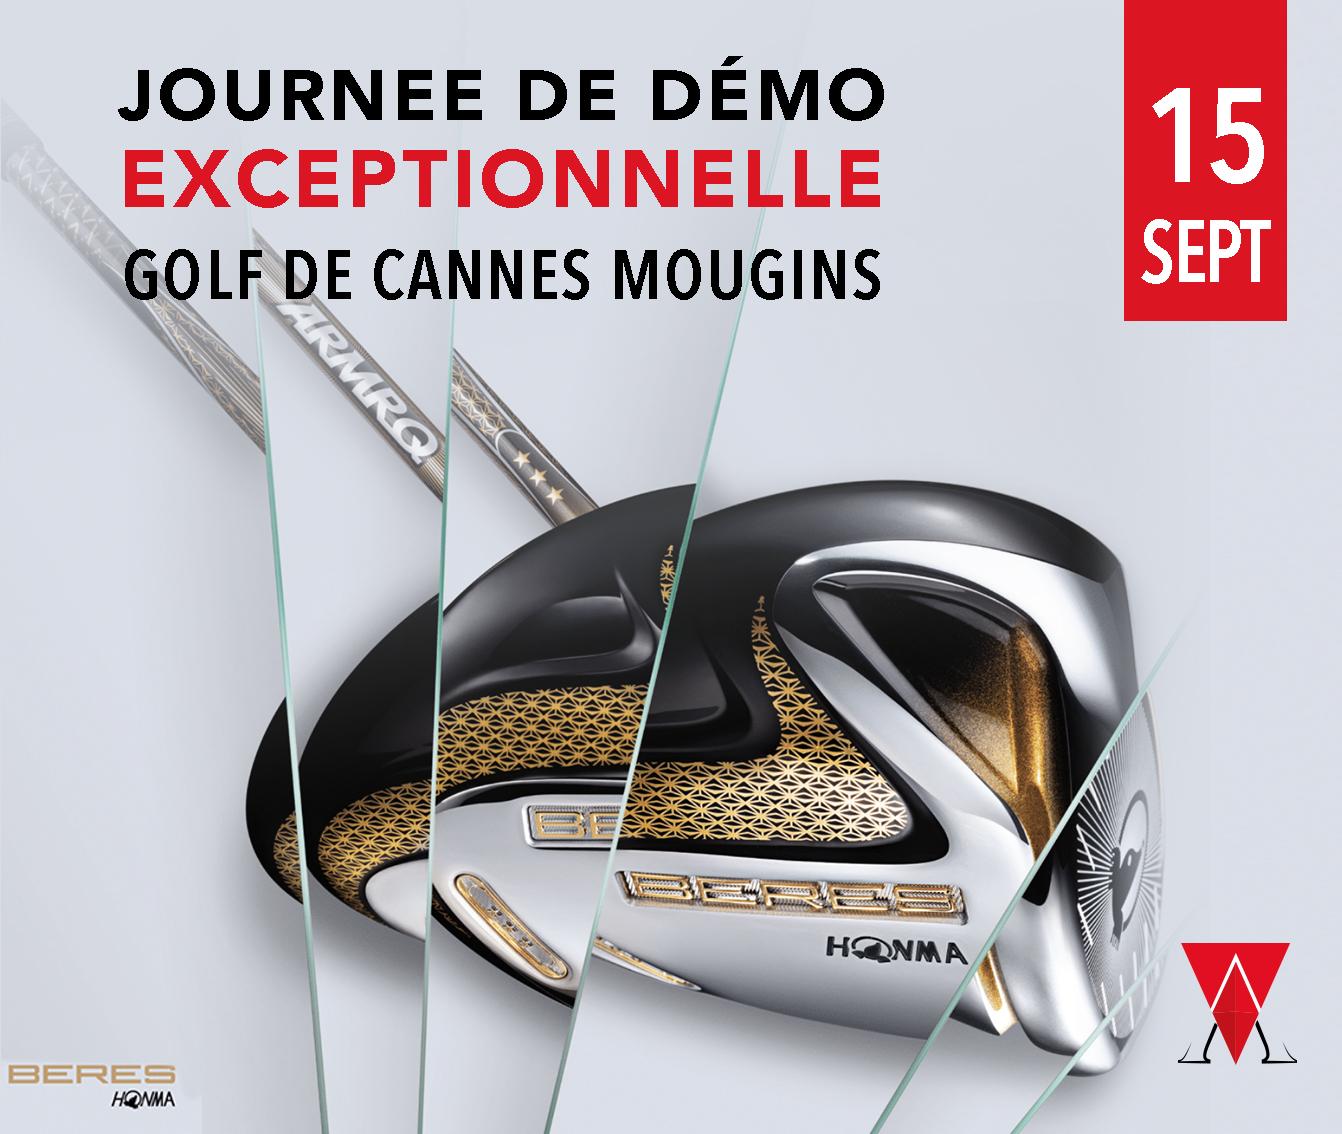 Journée Démonstration équipement Golf